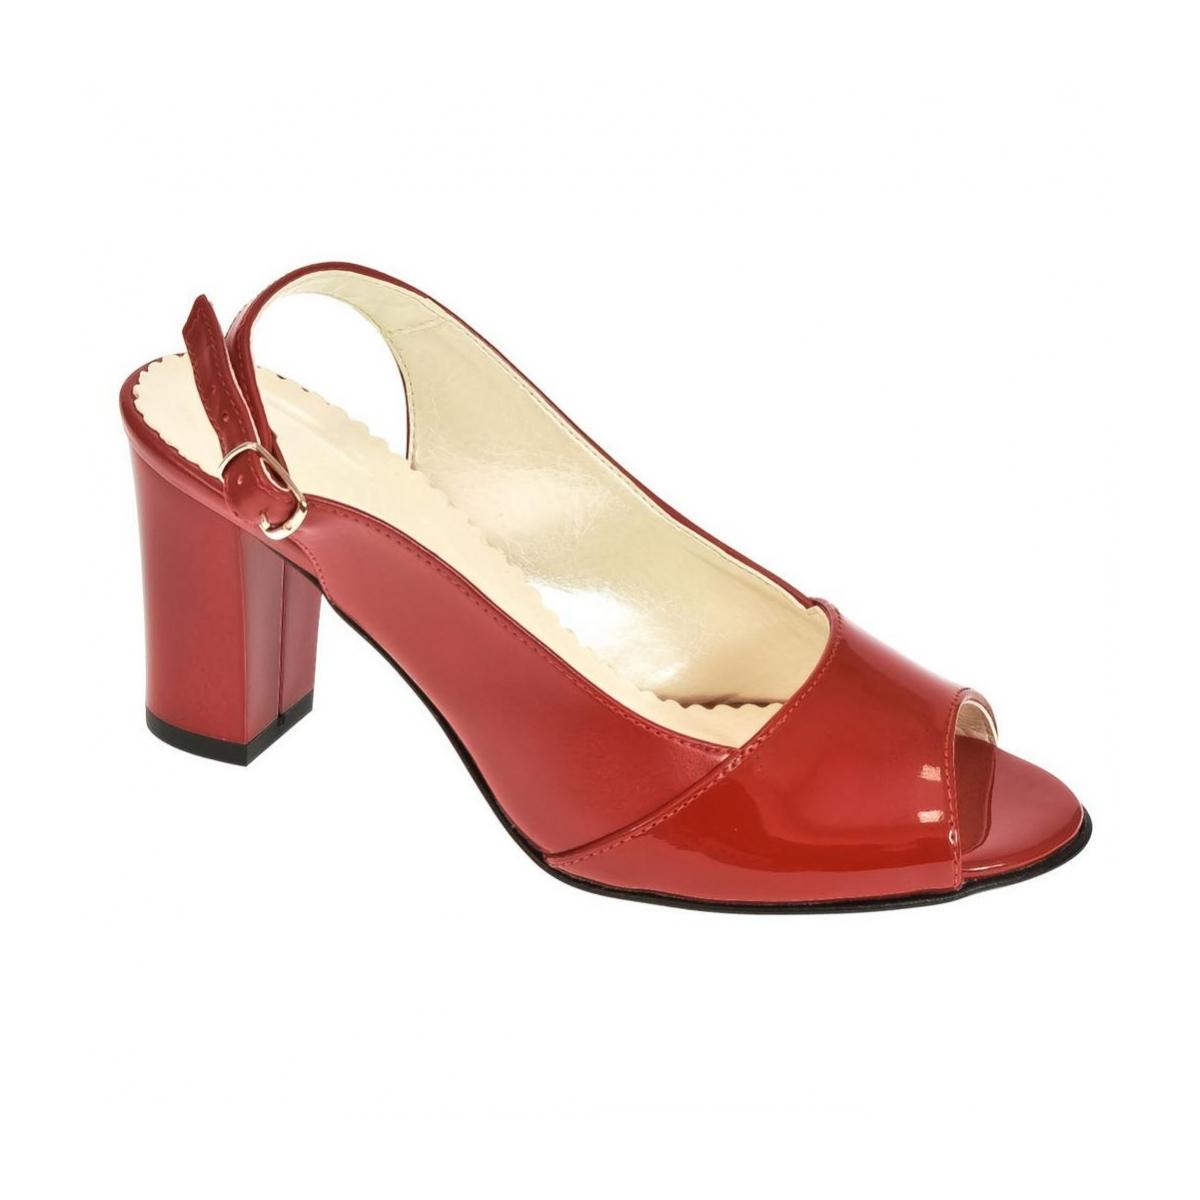 6379ccc72958 Dámske červené sandále SAINA - 4